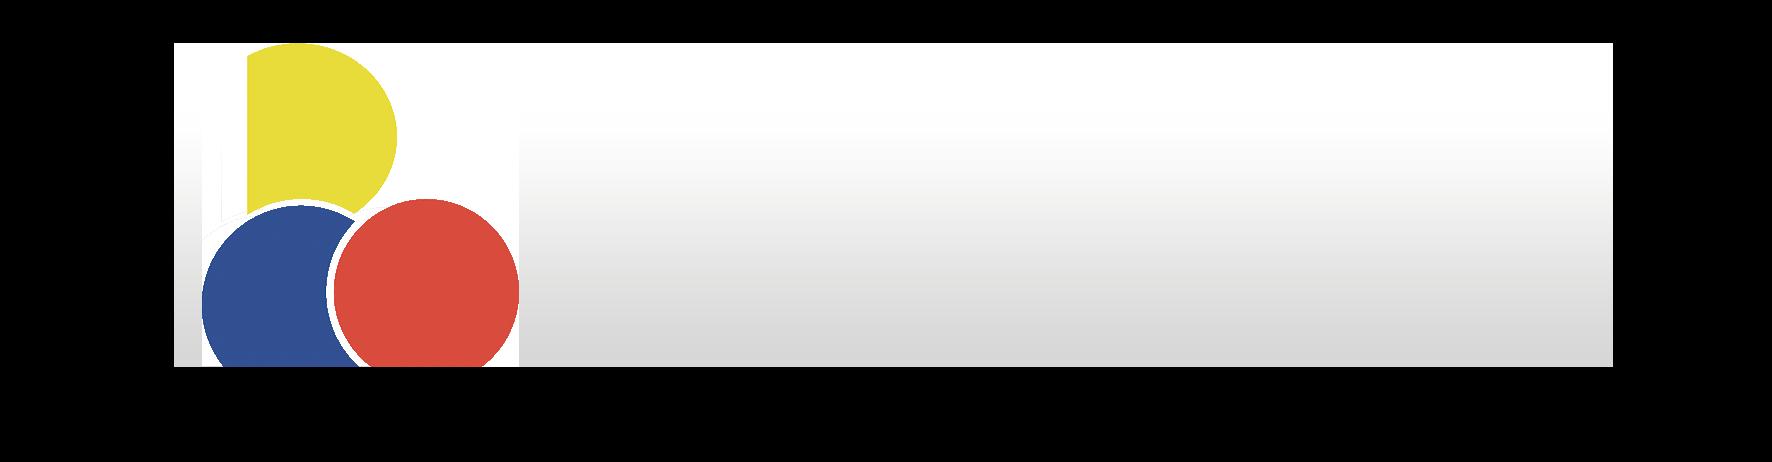 Pinturas Miguel Beltran Logo